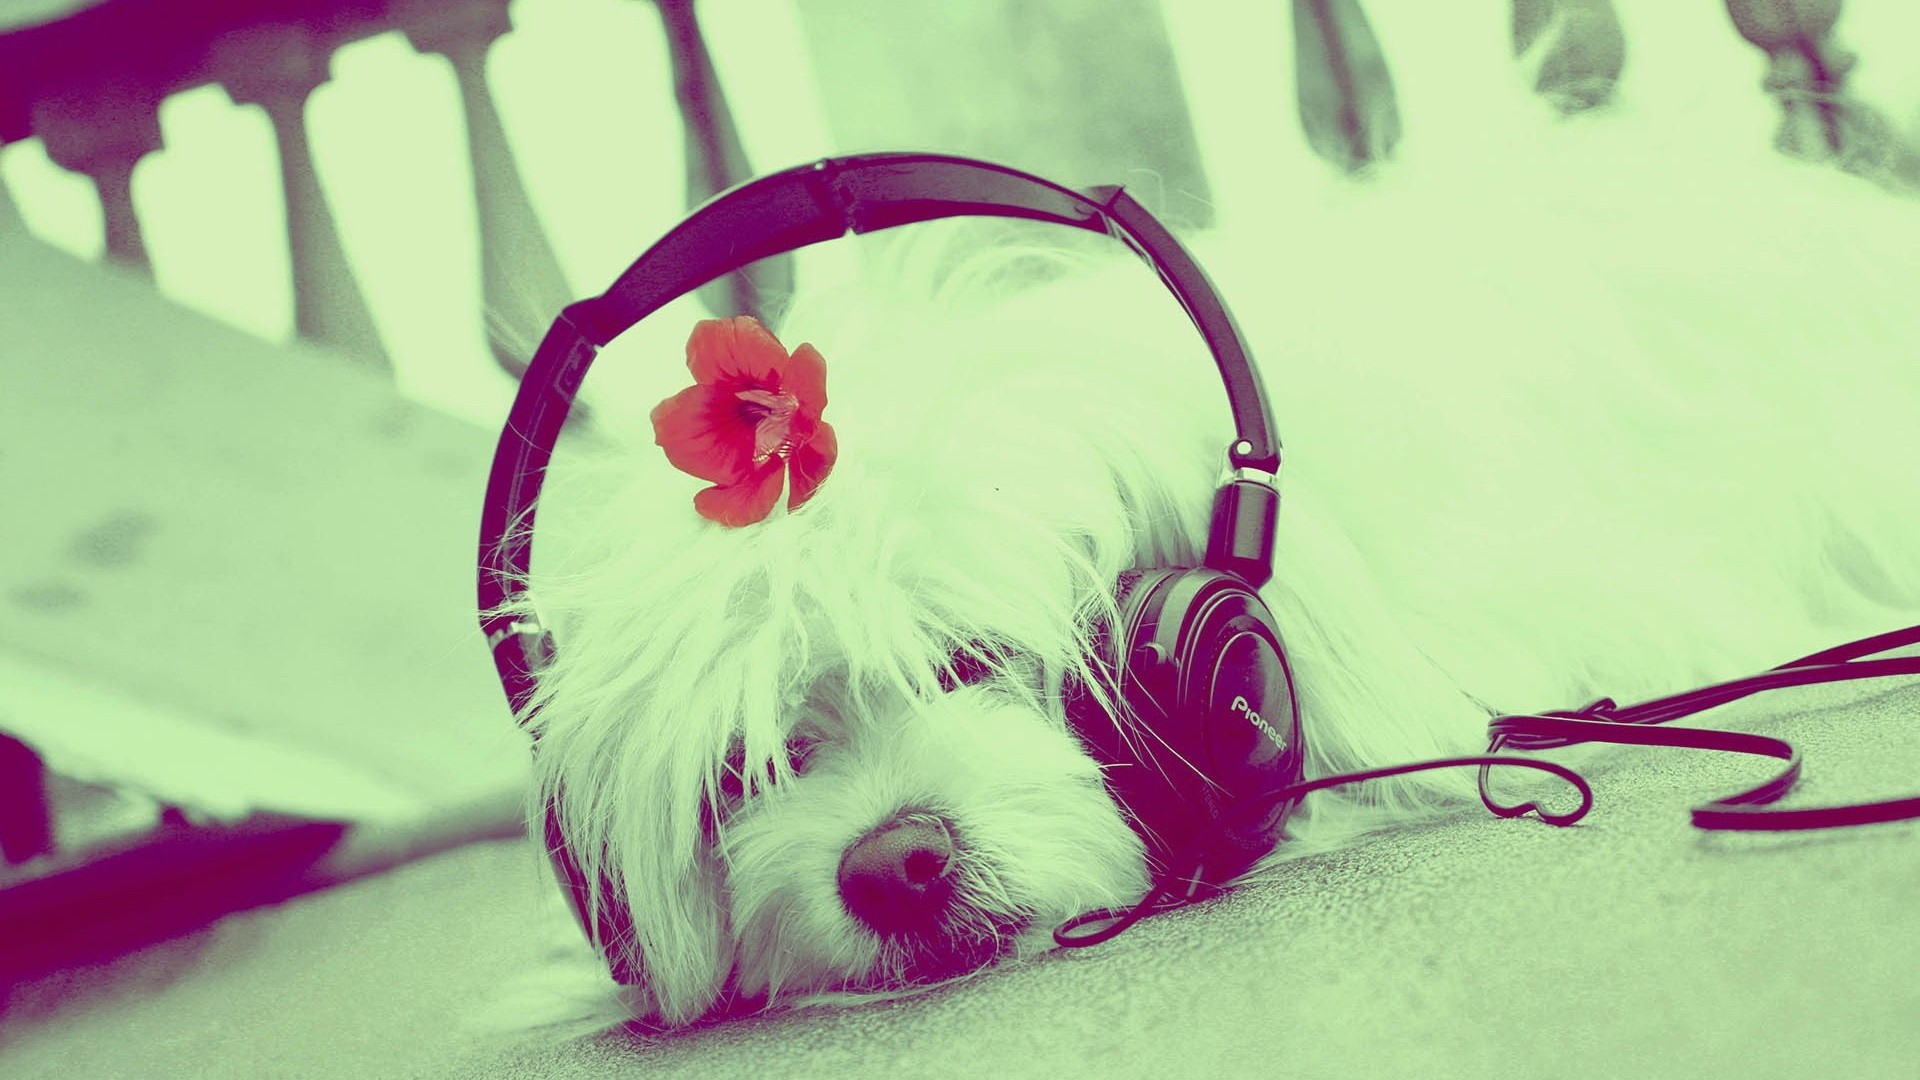 Cute Music Image